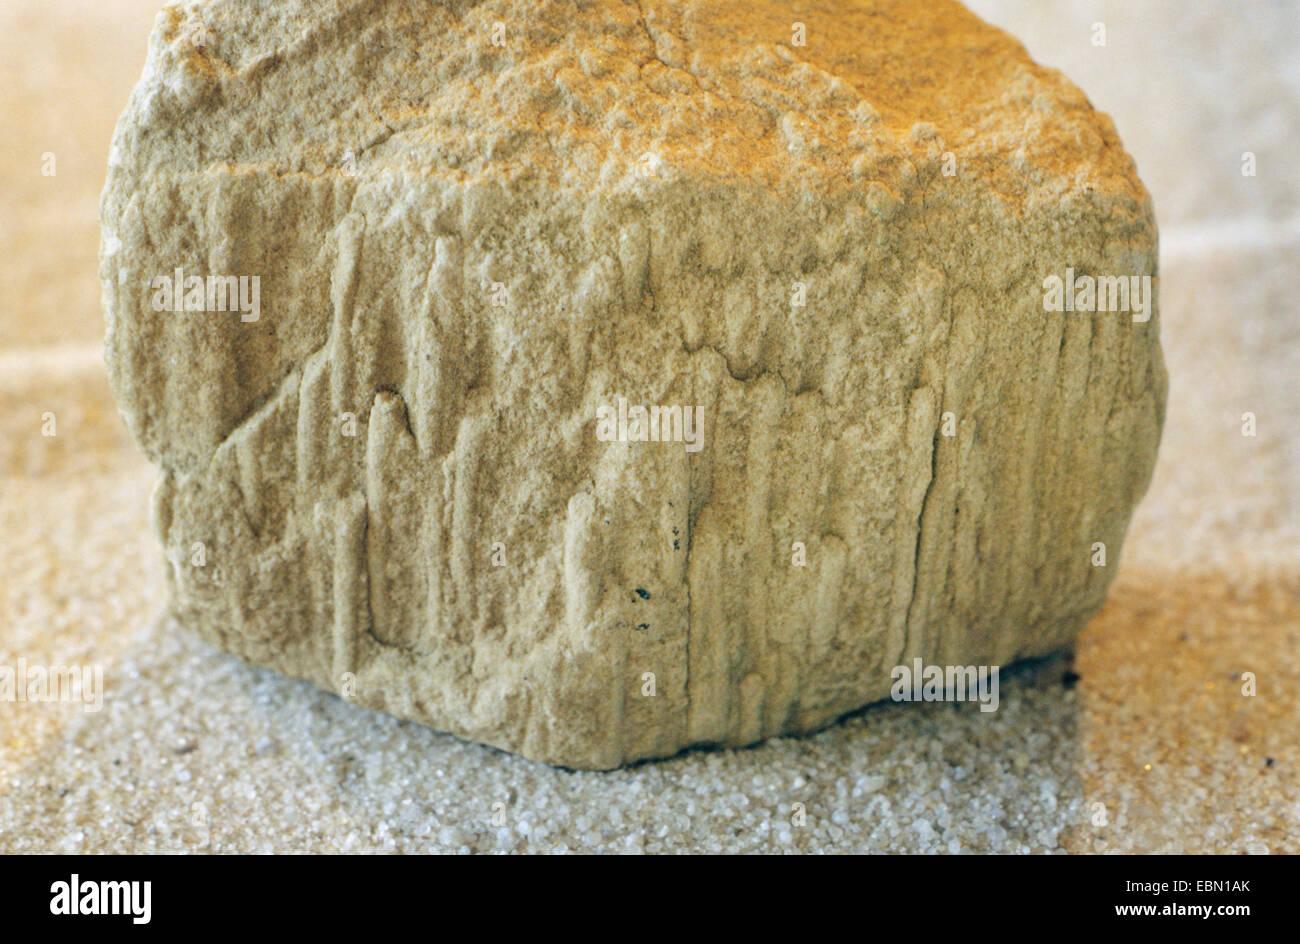 Bergaueria in sandstone - Stock Image